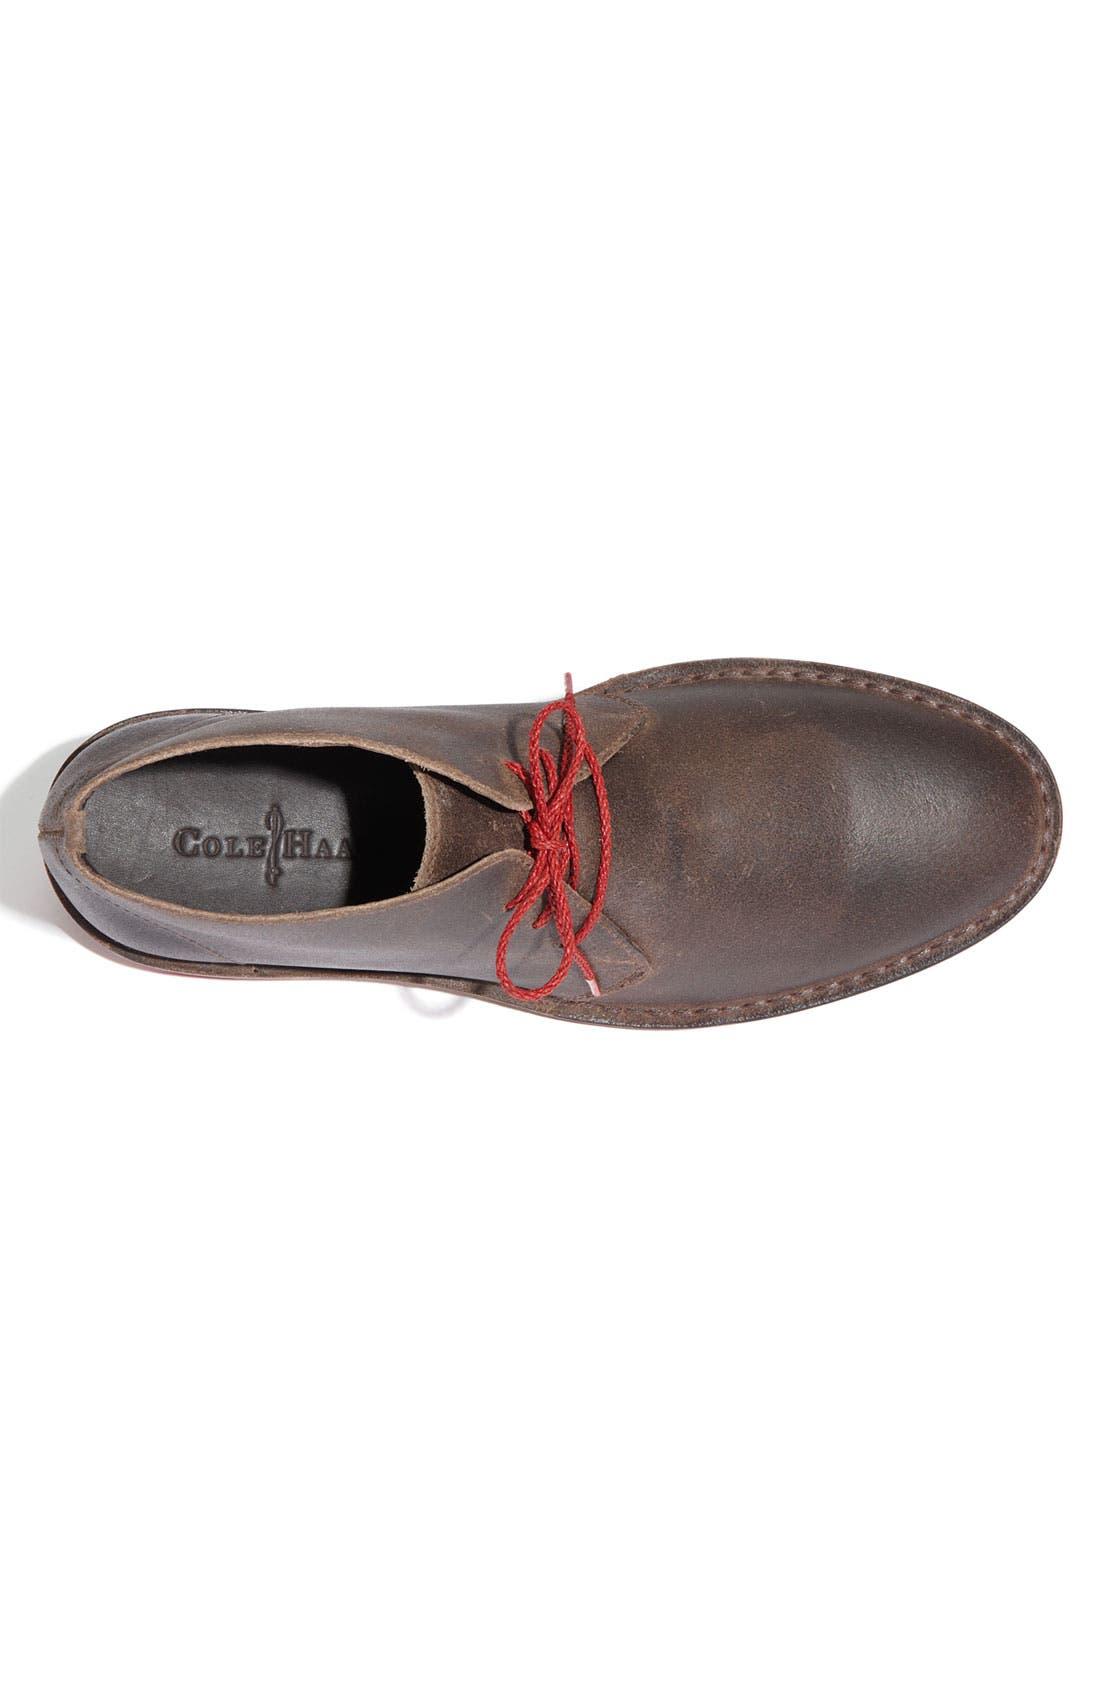 Alternate Image 3  - Cole Haan 'Paul' Chukka Boot